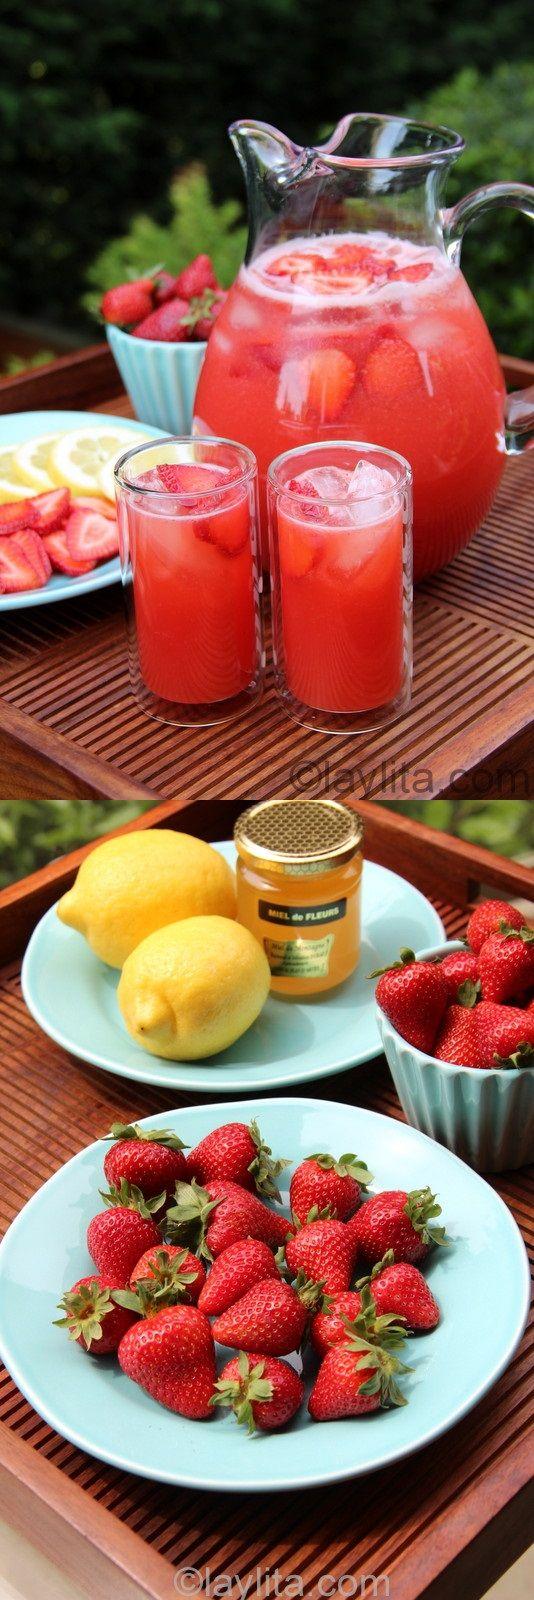 Homemade Strawberry Lemonade - Laylita's Recipes